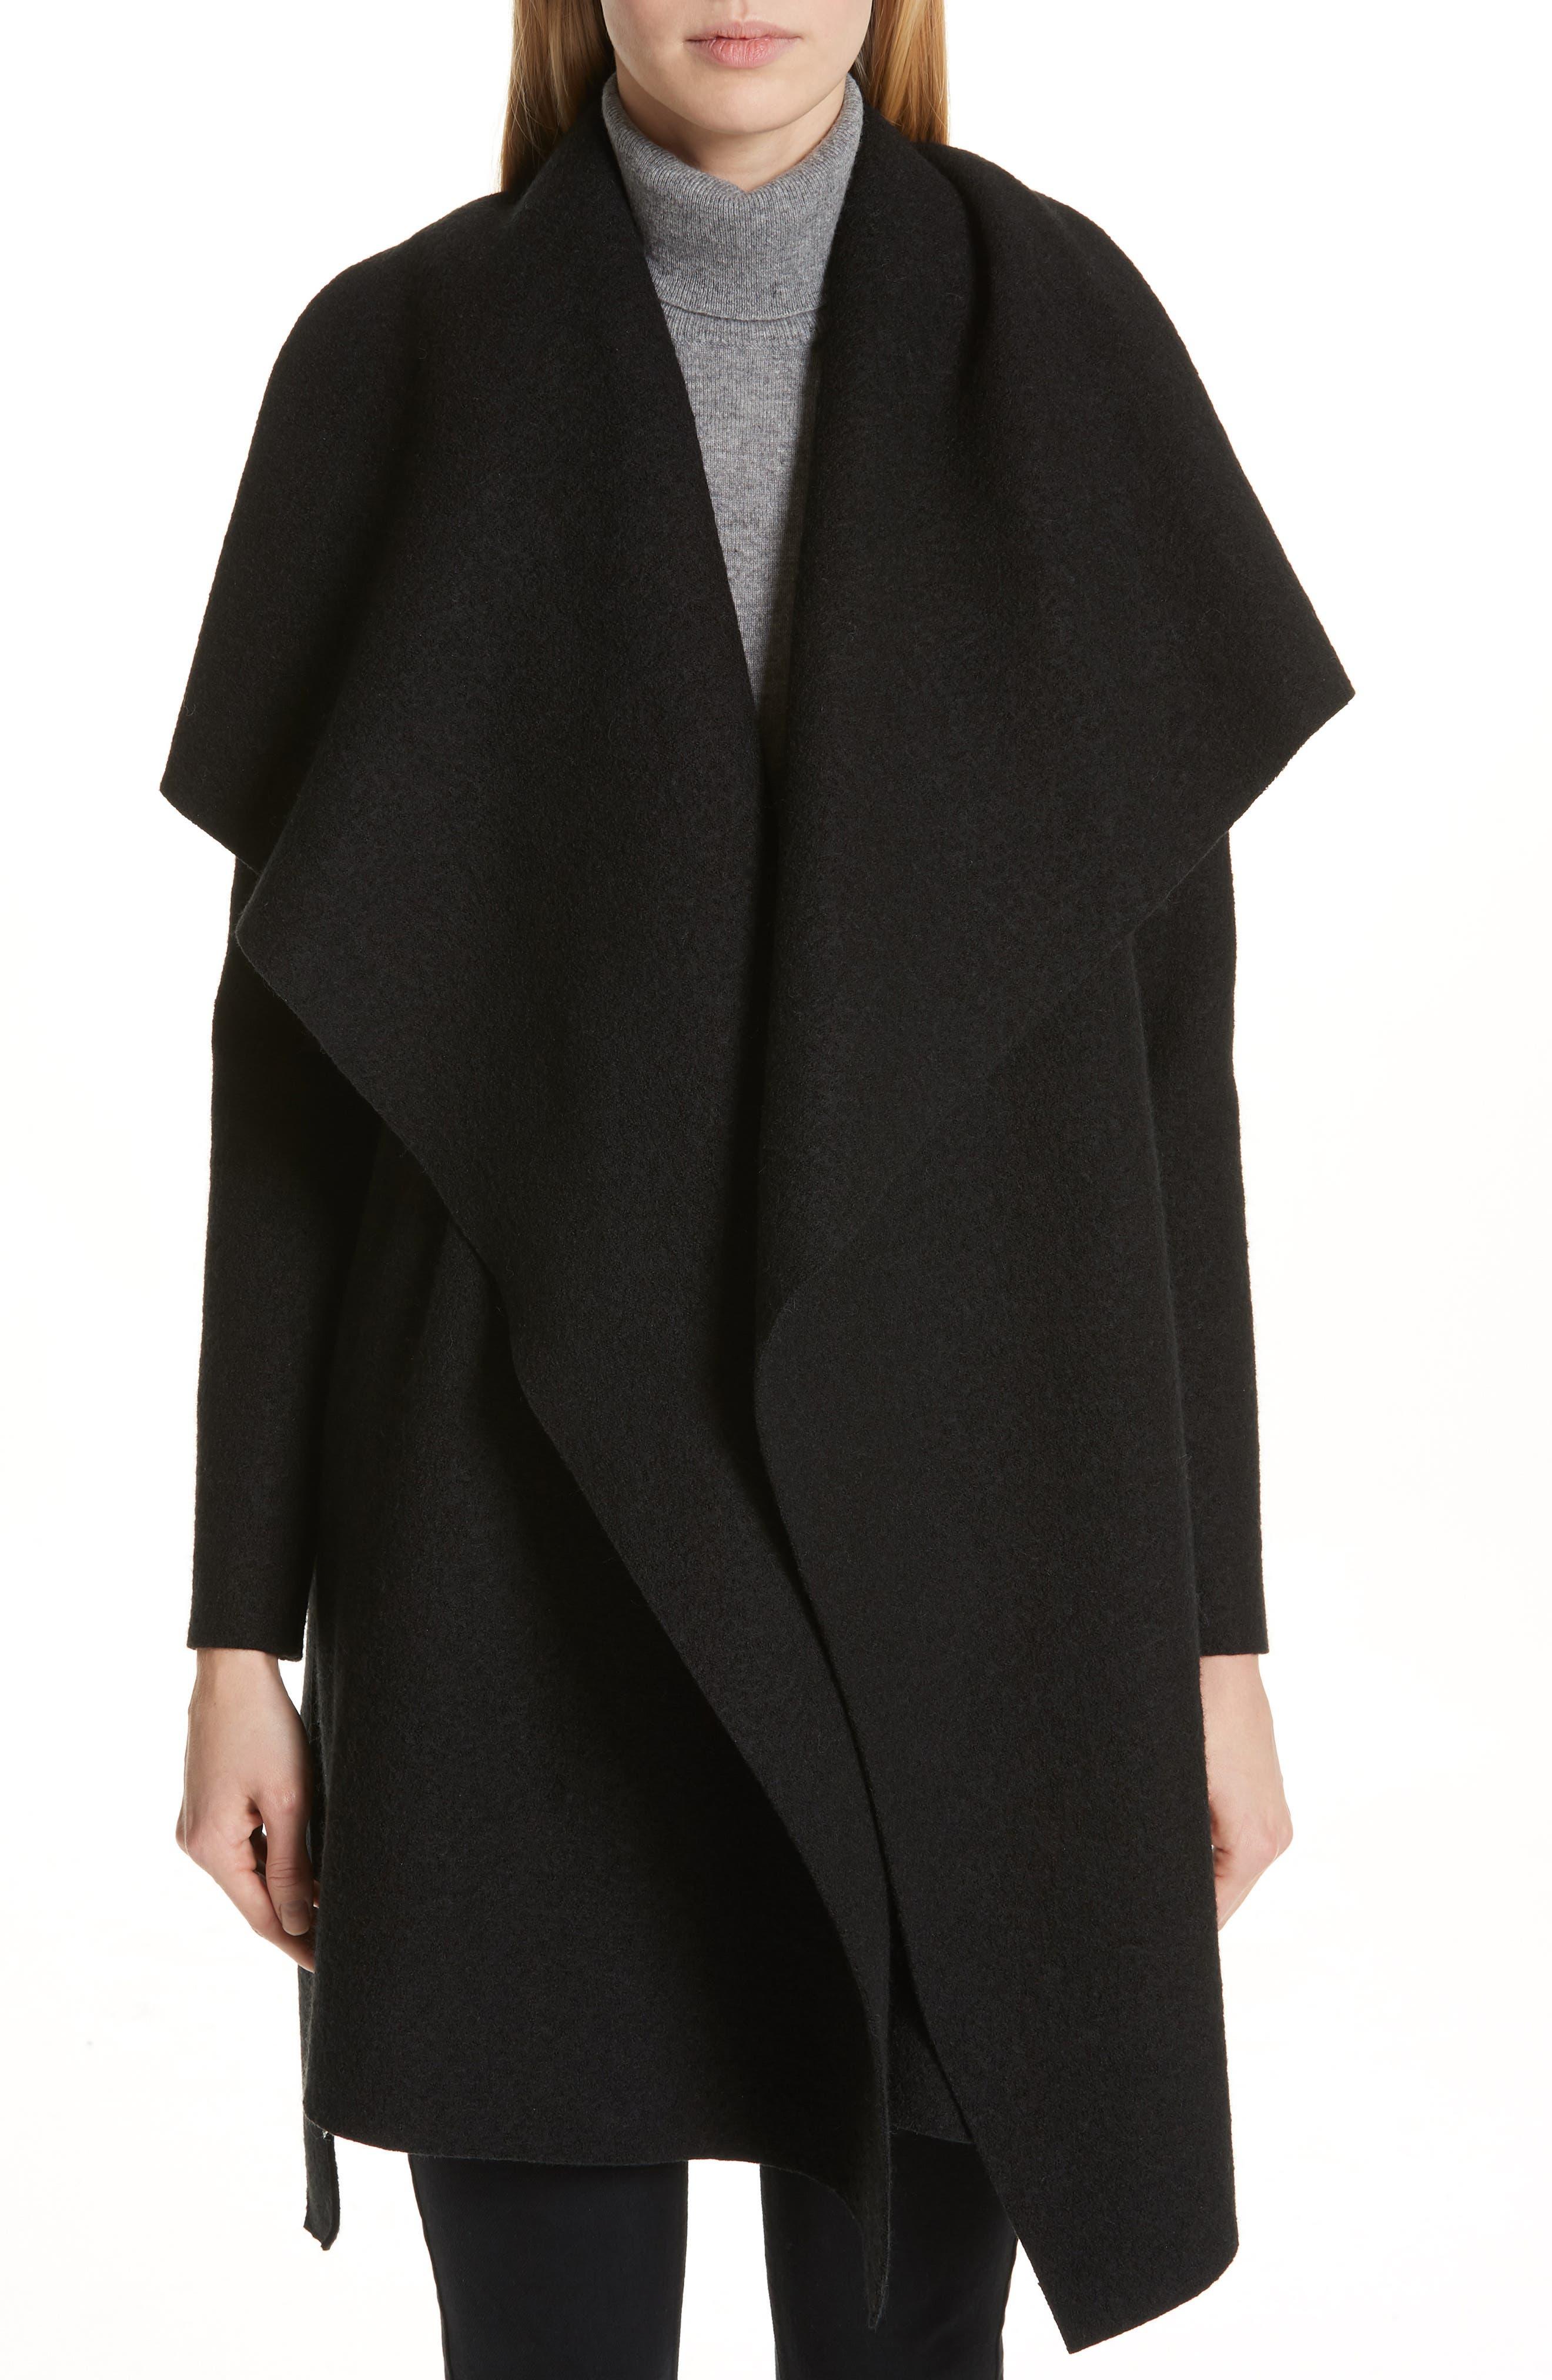 HARRIS WHARF LONDON, Belted Wool Coat, Main thumbnail 1, color, BLACK